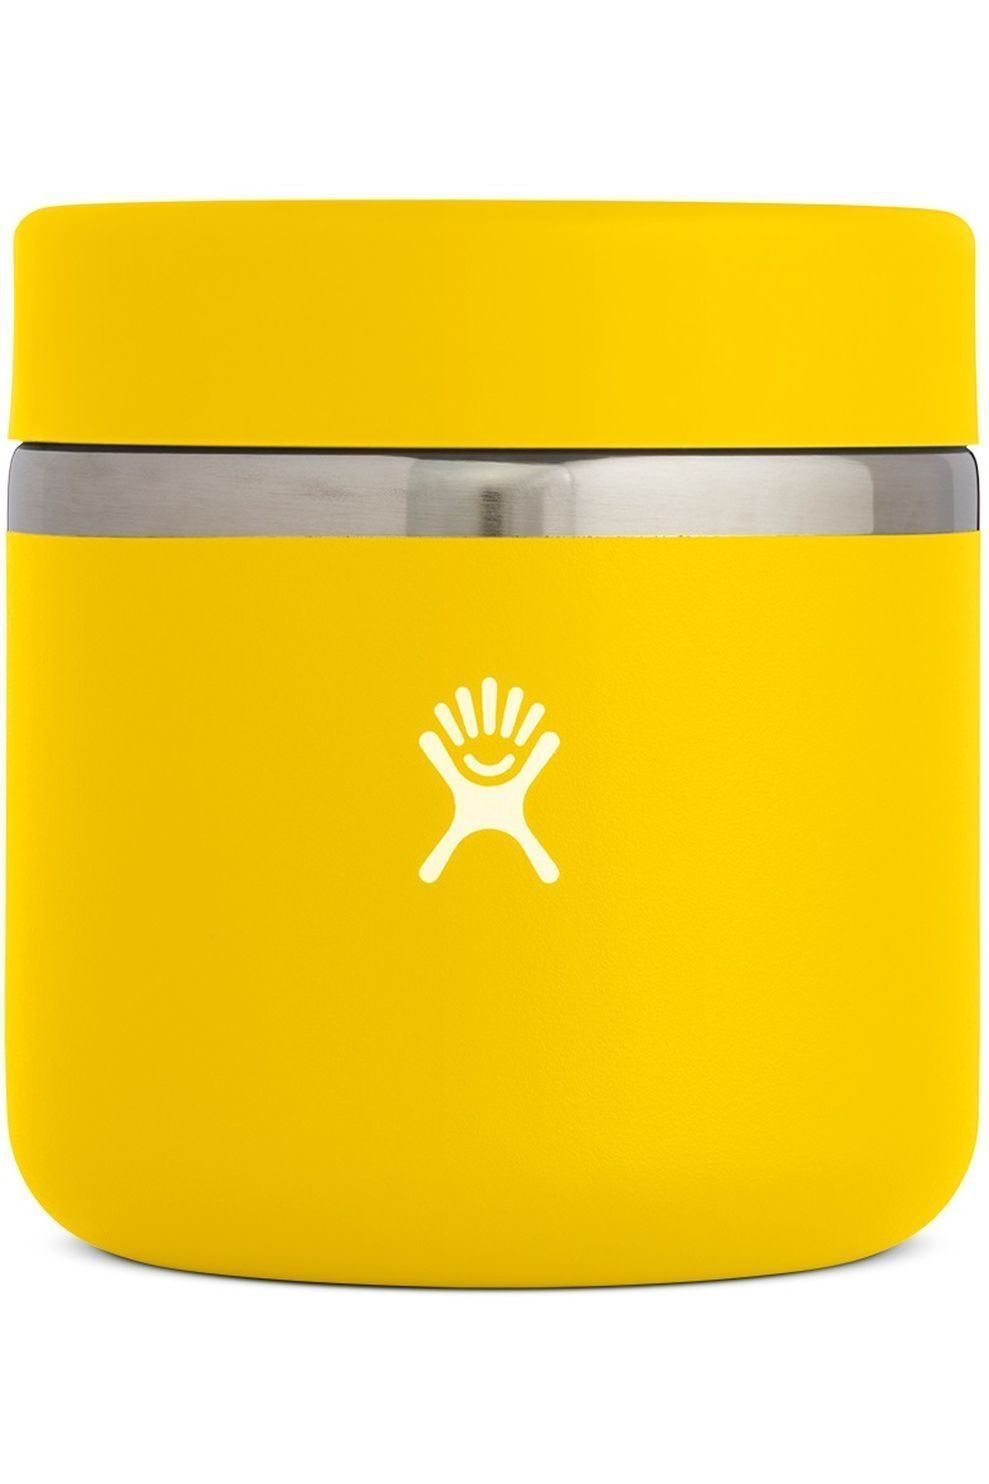 Hydro Flask Isolatiepot 20oz/591ml Insulated Food Jar - Geel